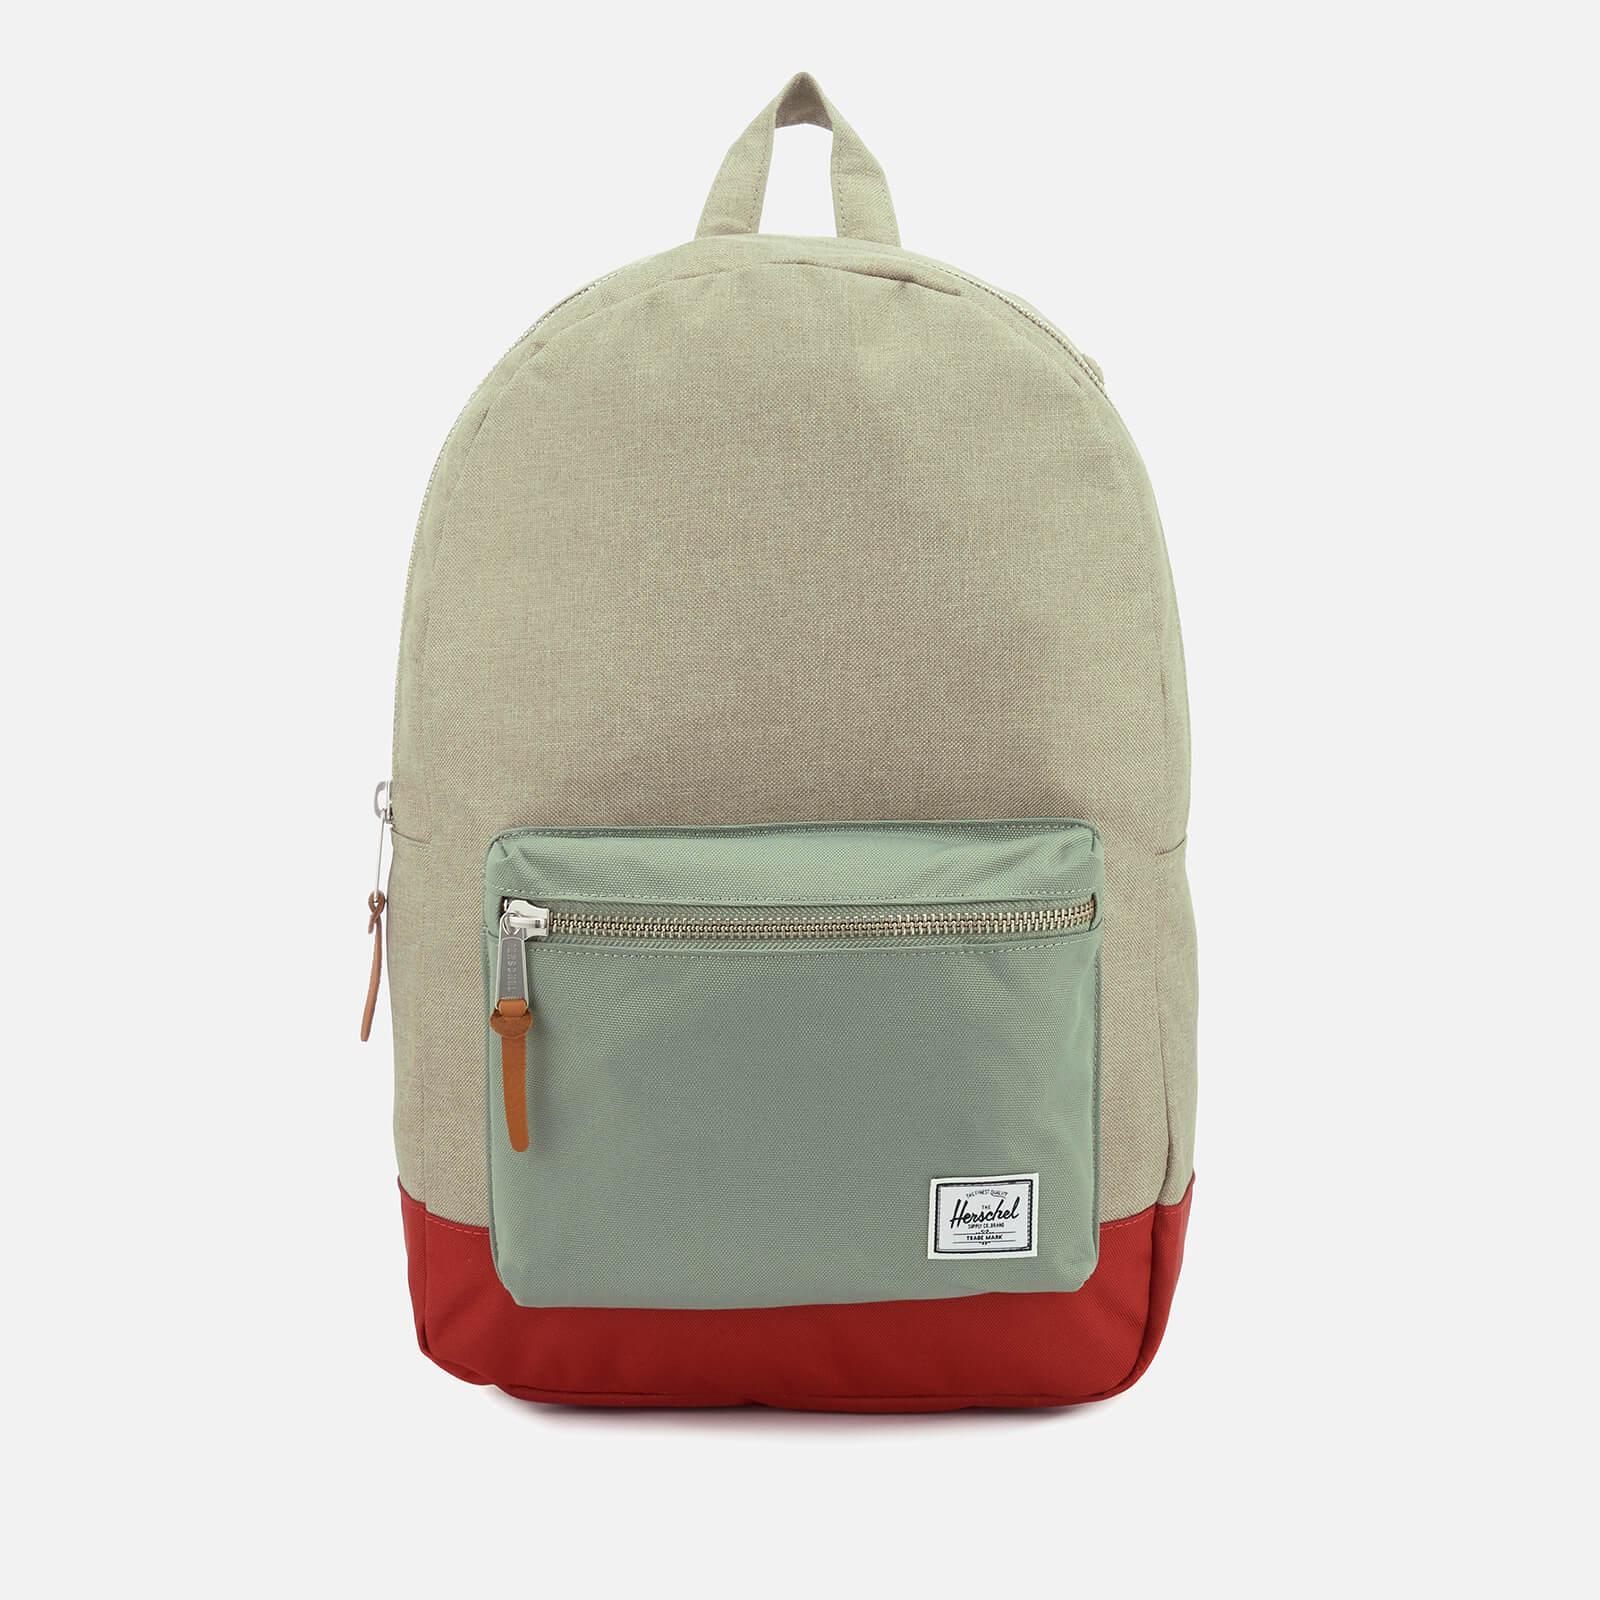 7bfc5bccc60 Men s Settlement Backpack - Light Khaki Crosshatch Shadow Brick Red